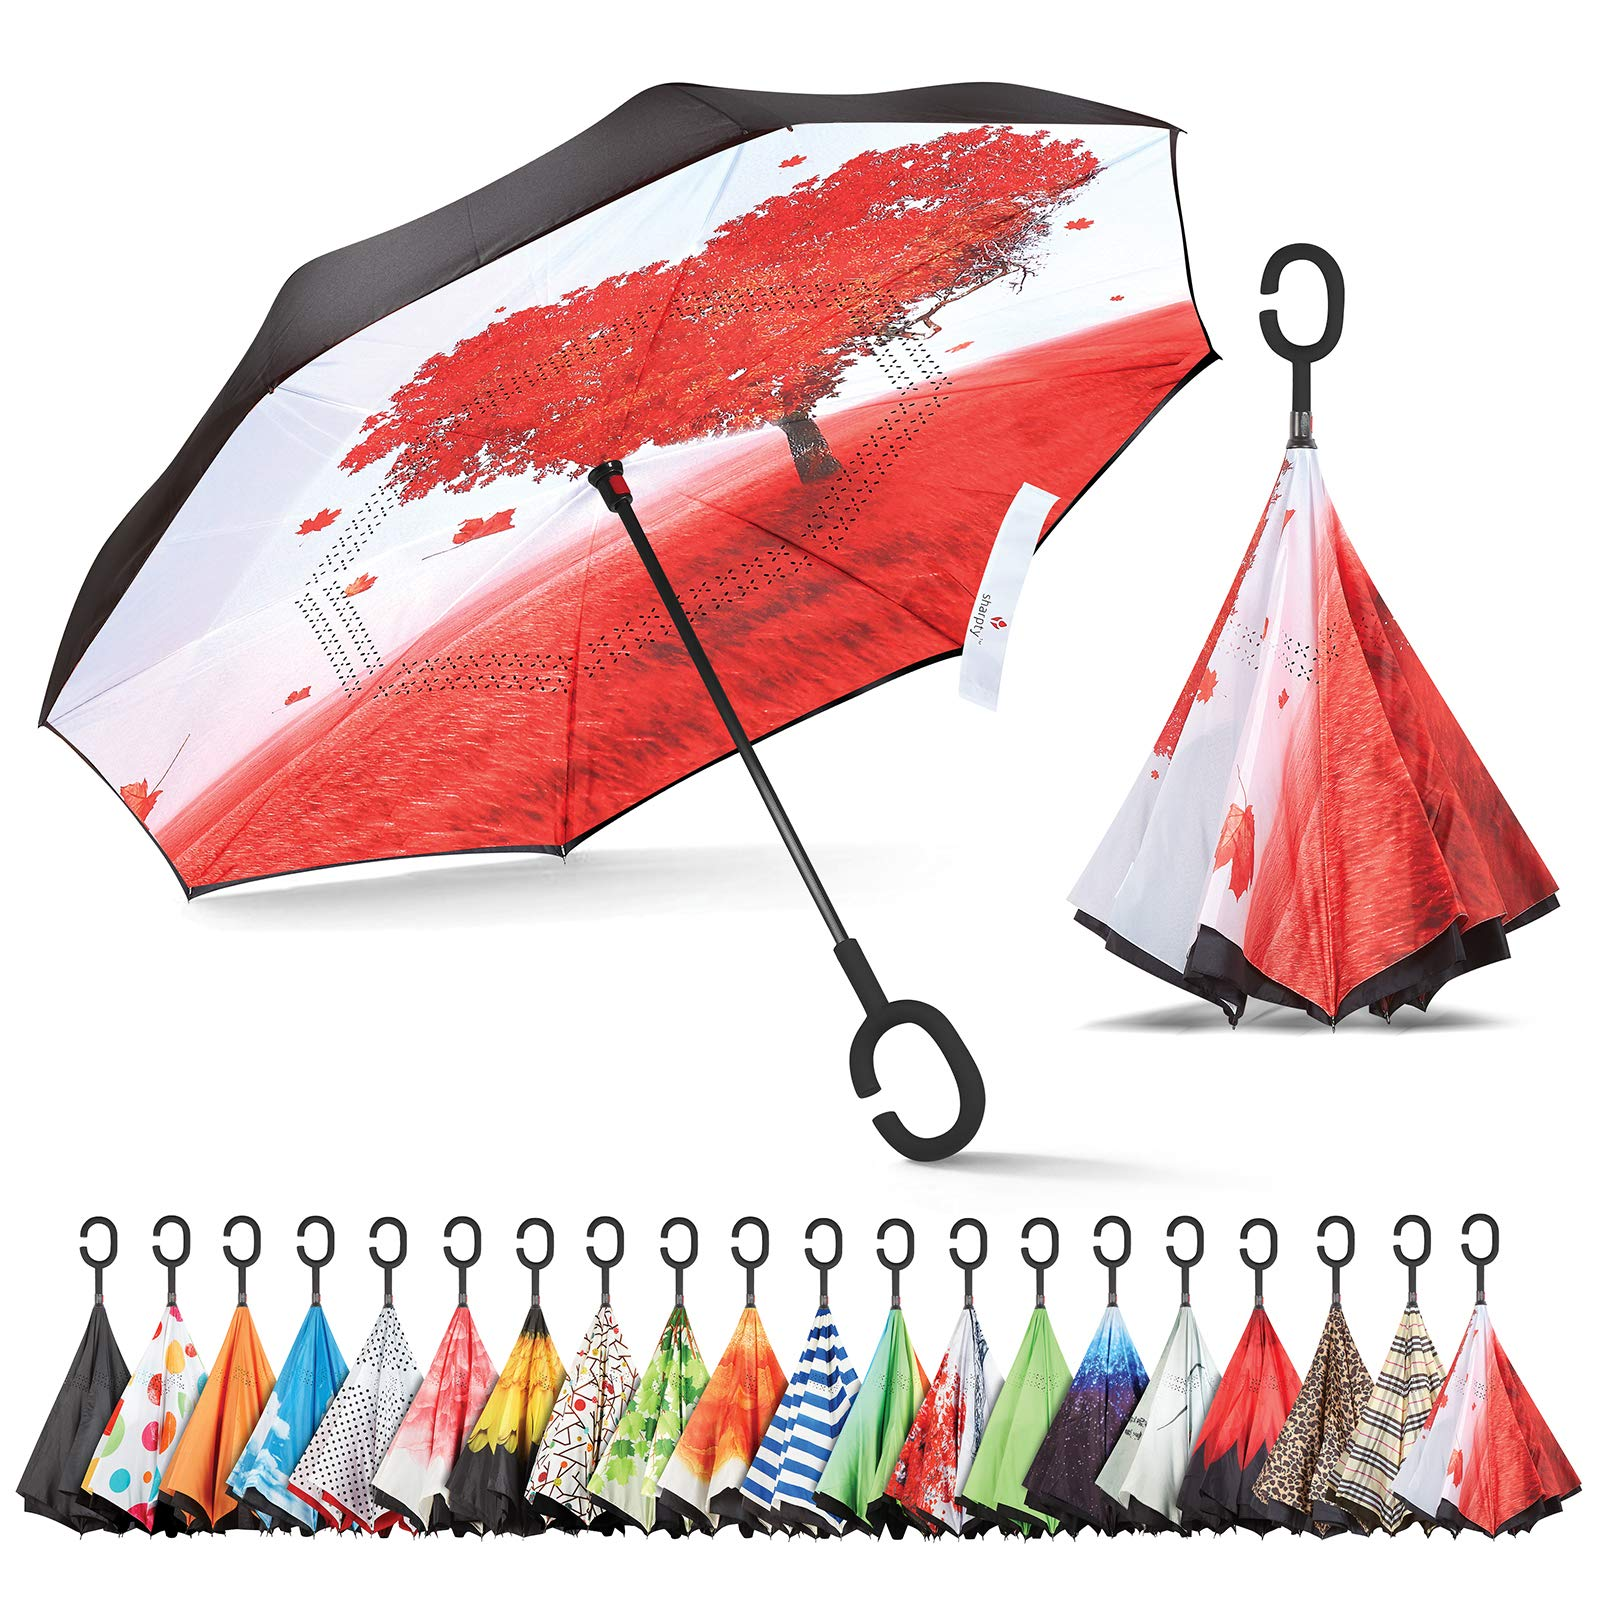 Sharpty Inverted Umbrella, Umbrella Windproof, Reverse Umbrella, Umbrellas for Women with UV Protection, Upside Down Umbrella with C-Shaped Handle (Love Tree)